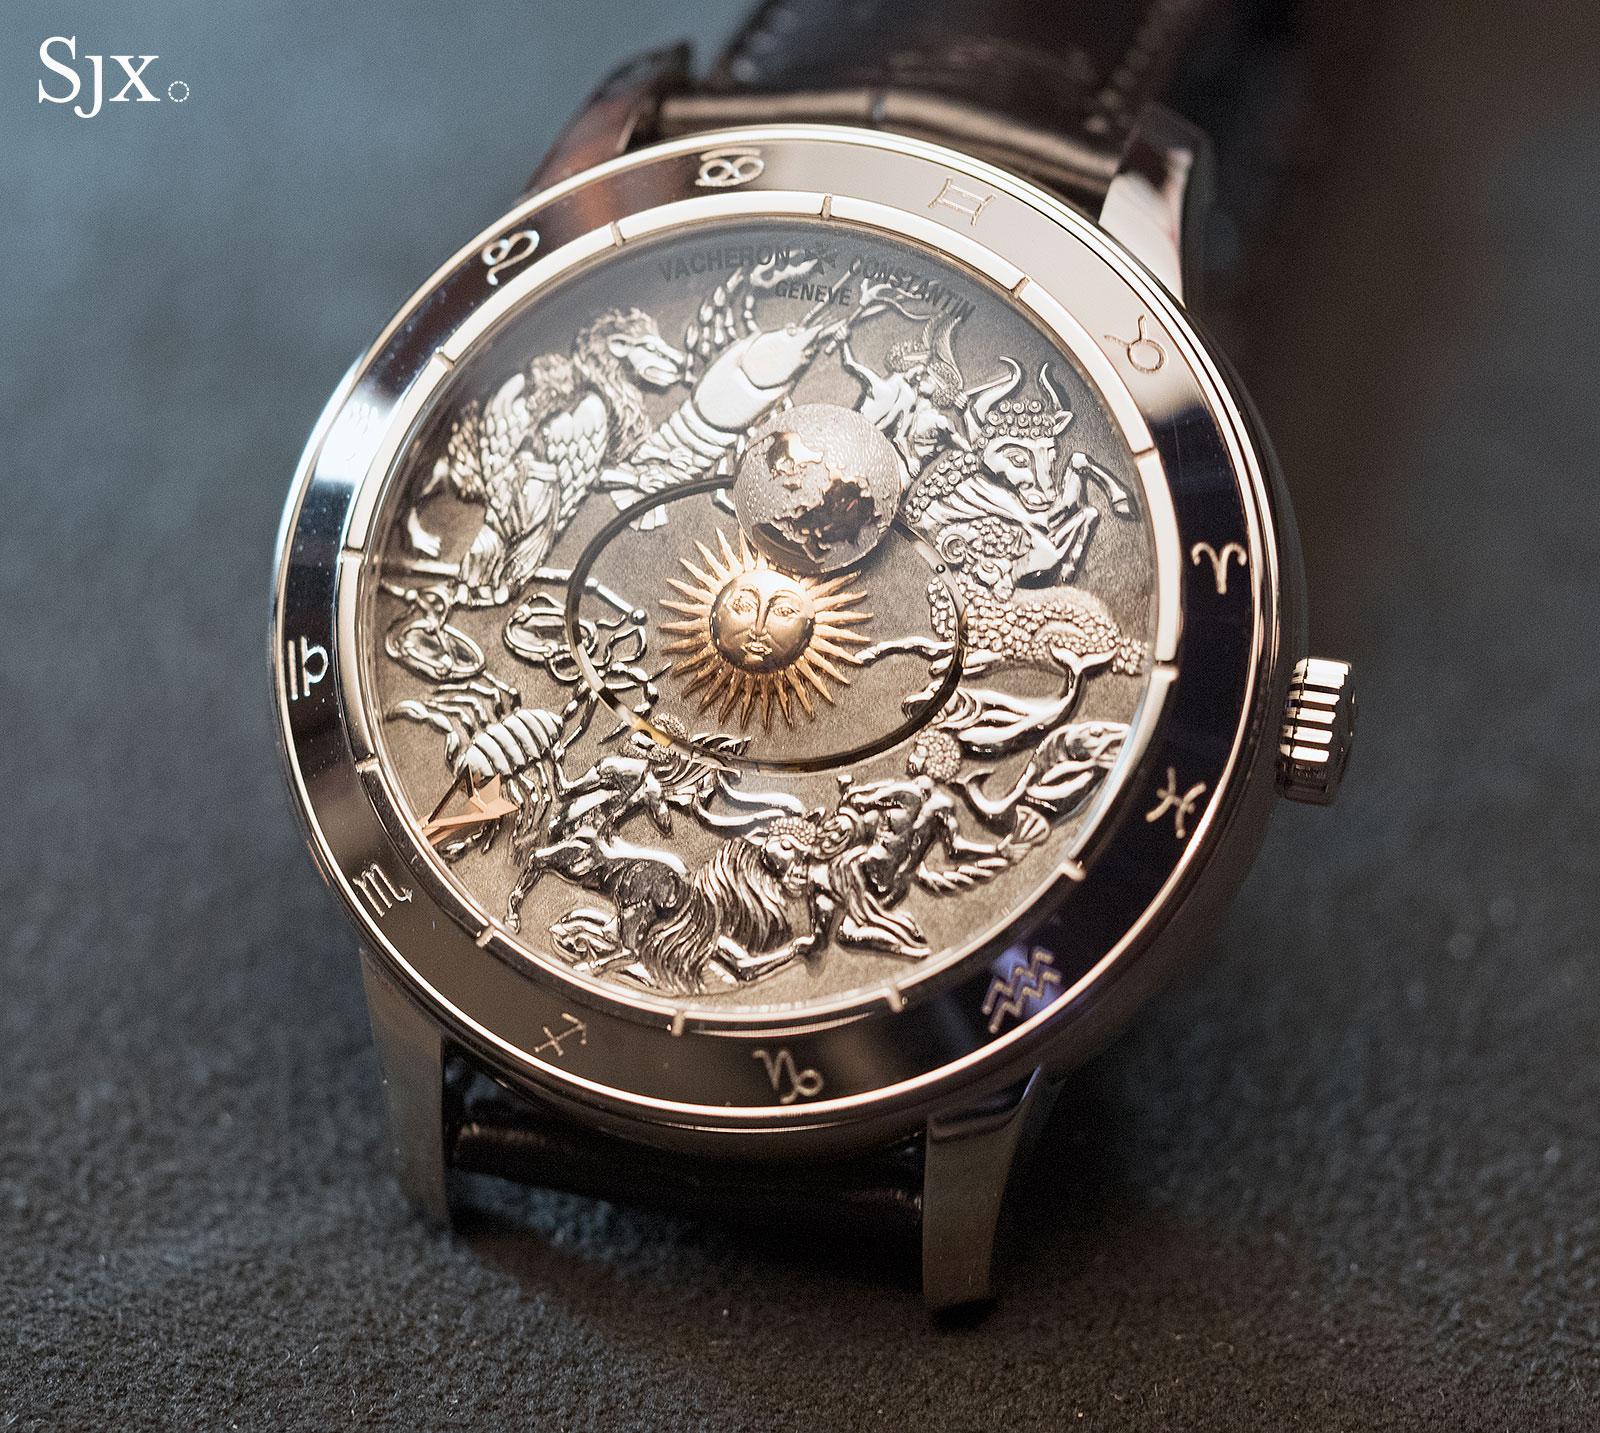 Vacheron Constantin Copernicus hand engraved 1